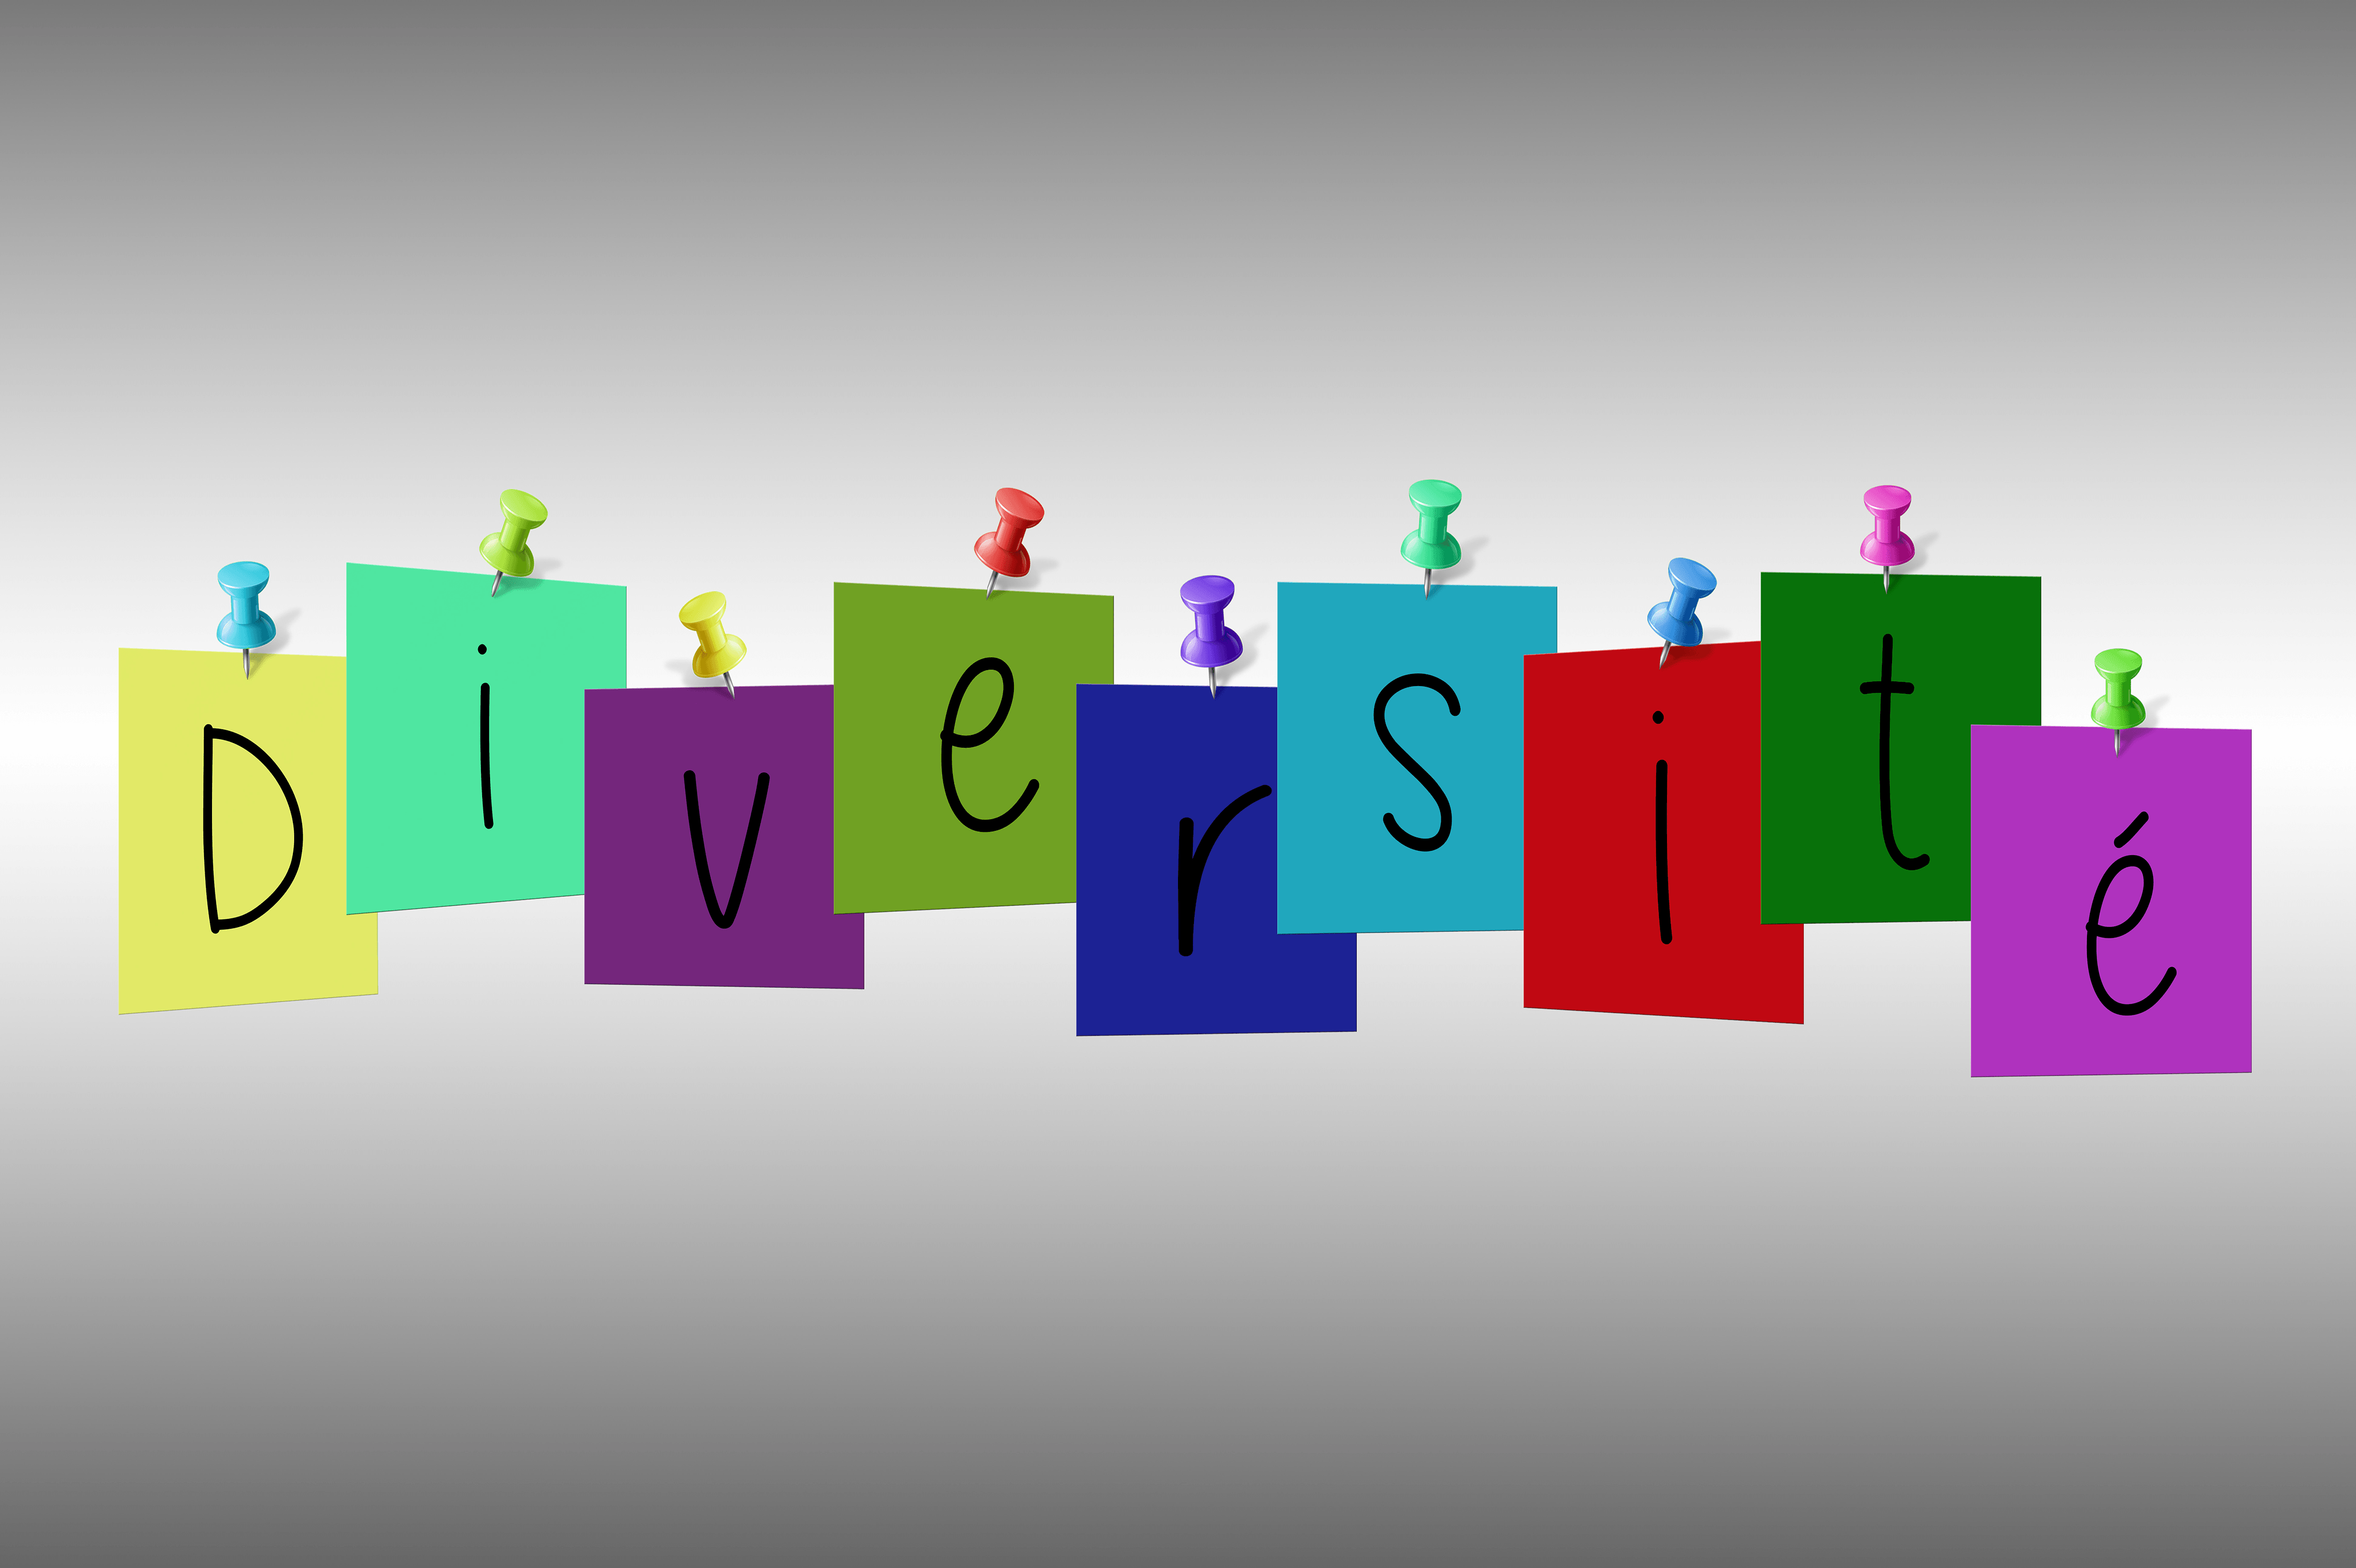 5 id u00e9es re u00e7ues sur la diversit u00e9 en entreprise